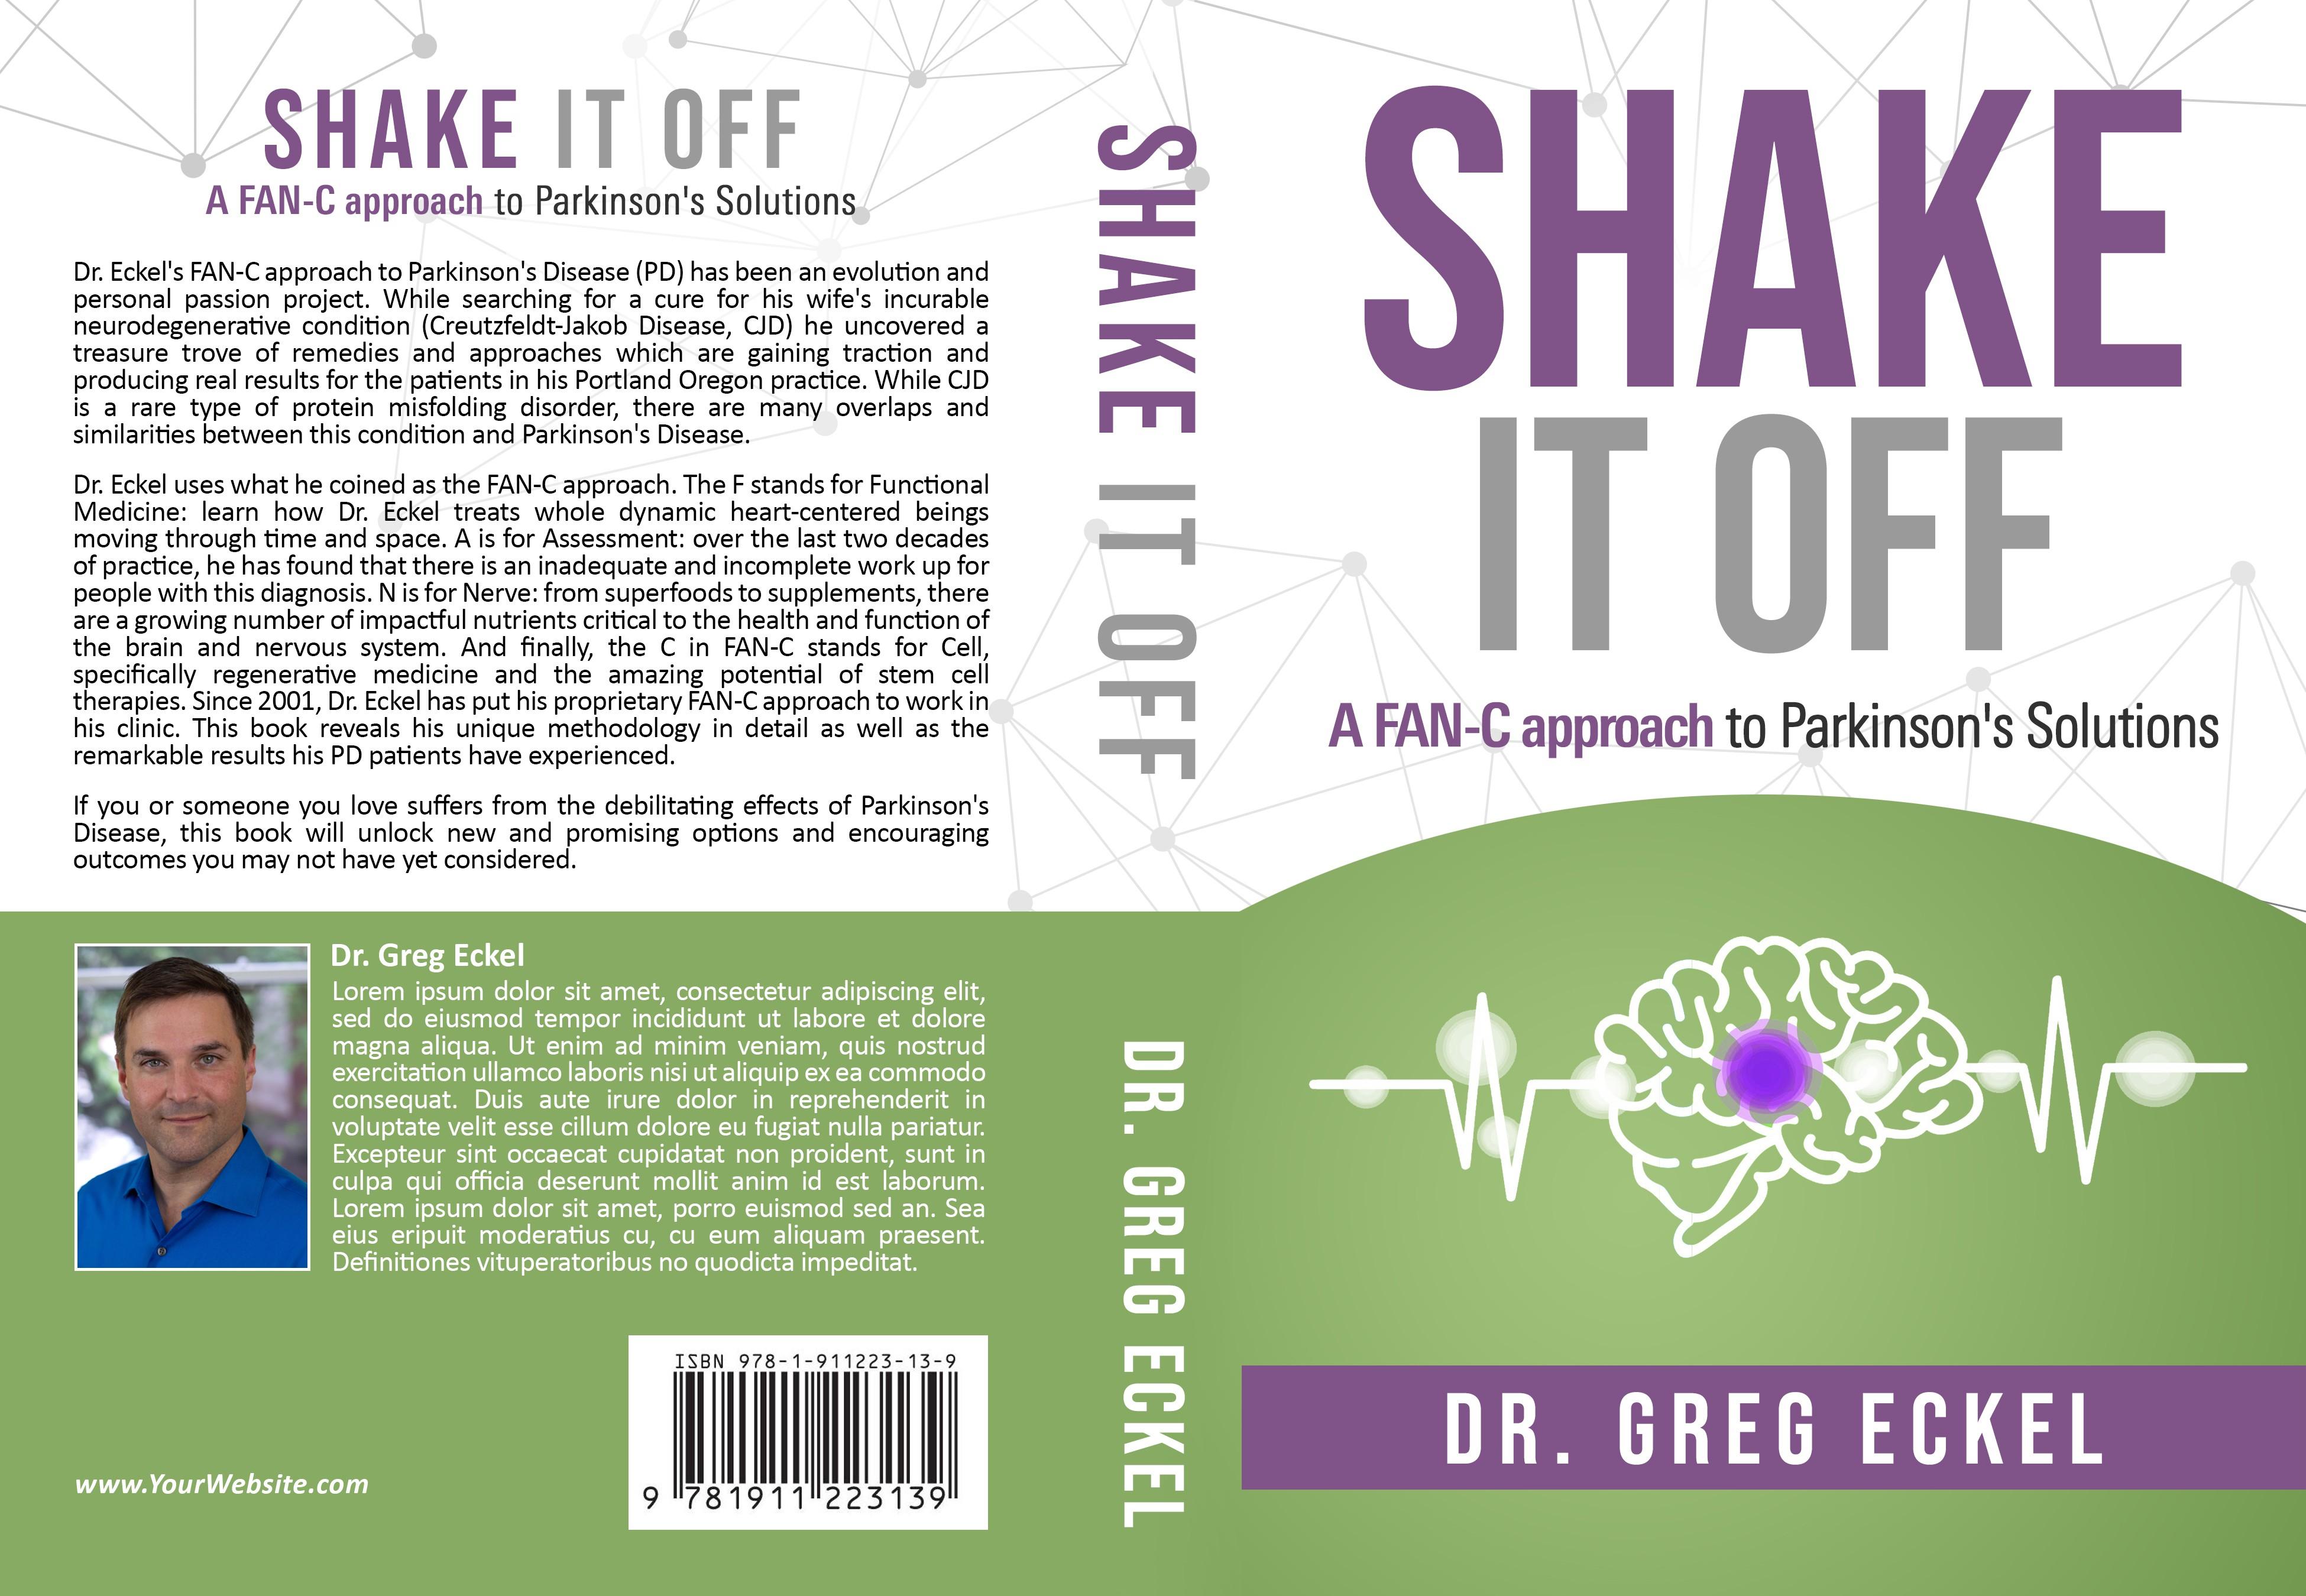 Book on Parkinson's Disease